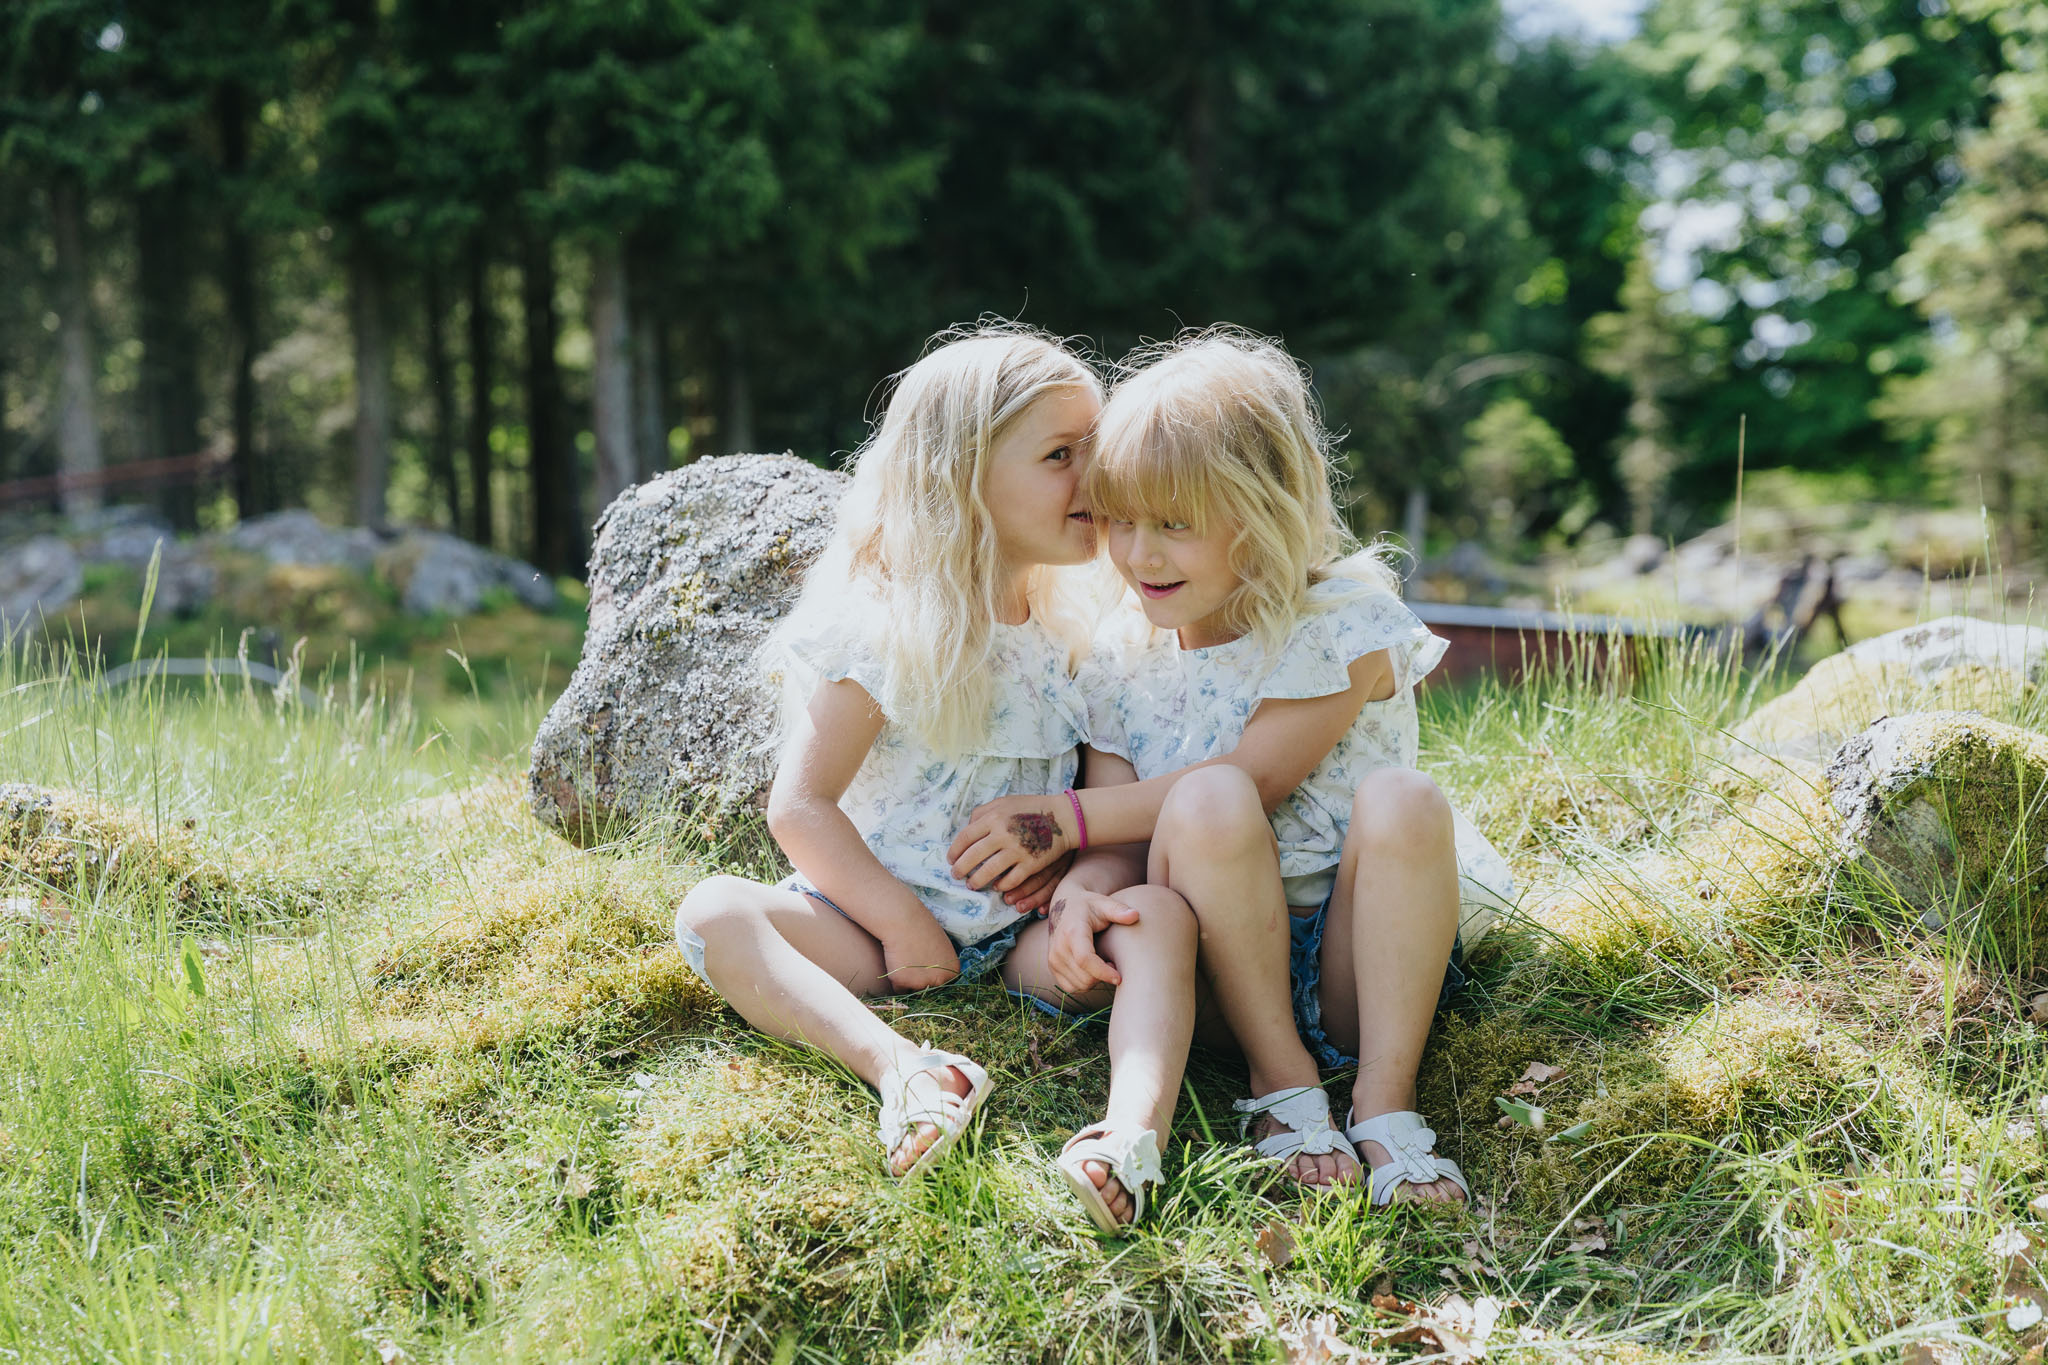 2018 05 20  Familjefotografering Almarsson, Fotograf Emy, 15.jpg